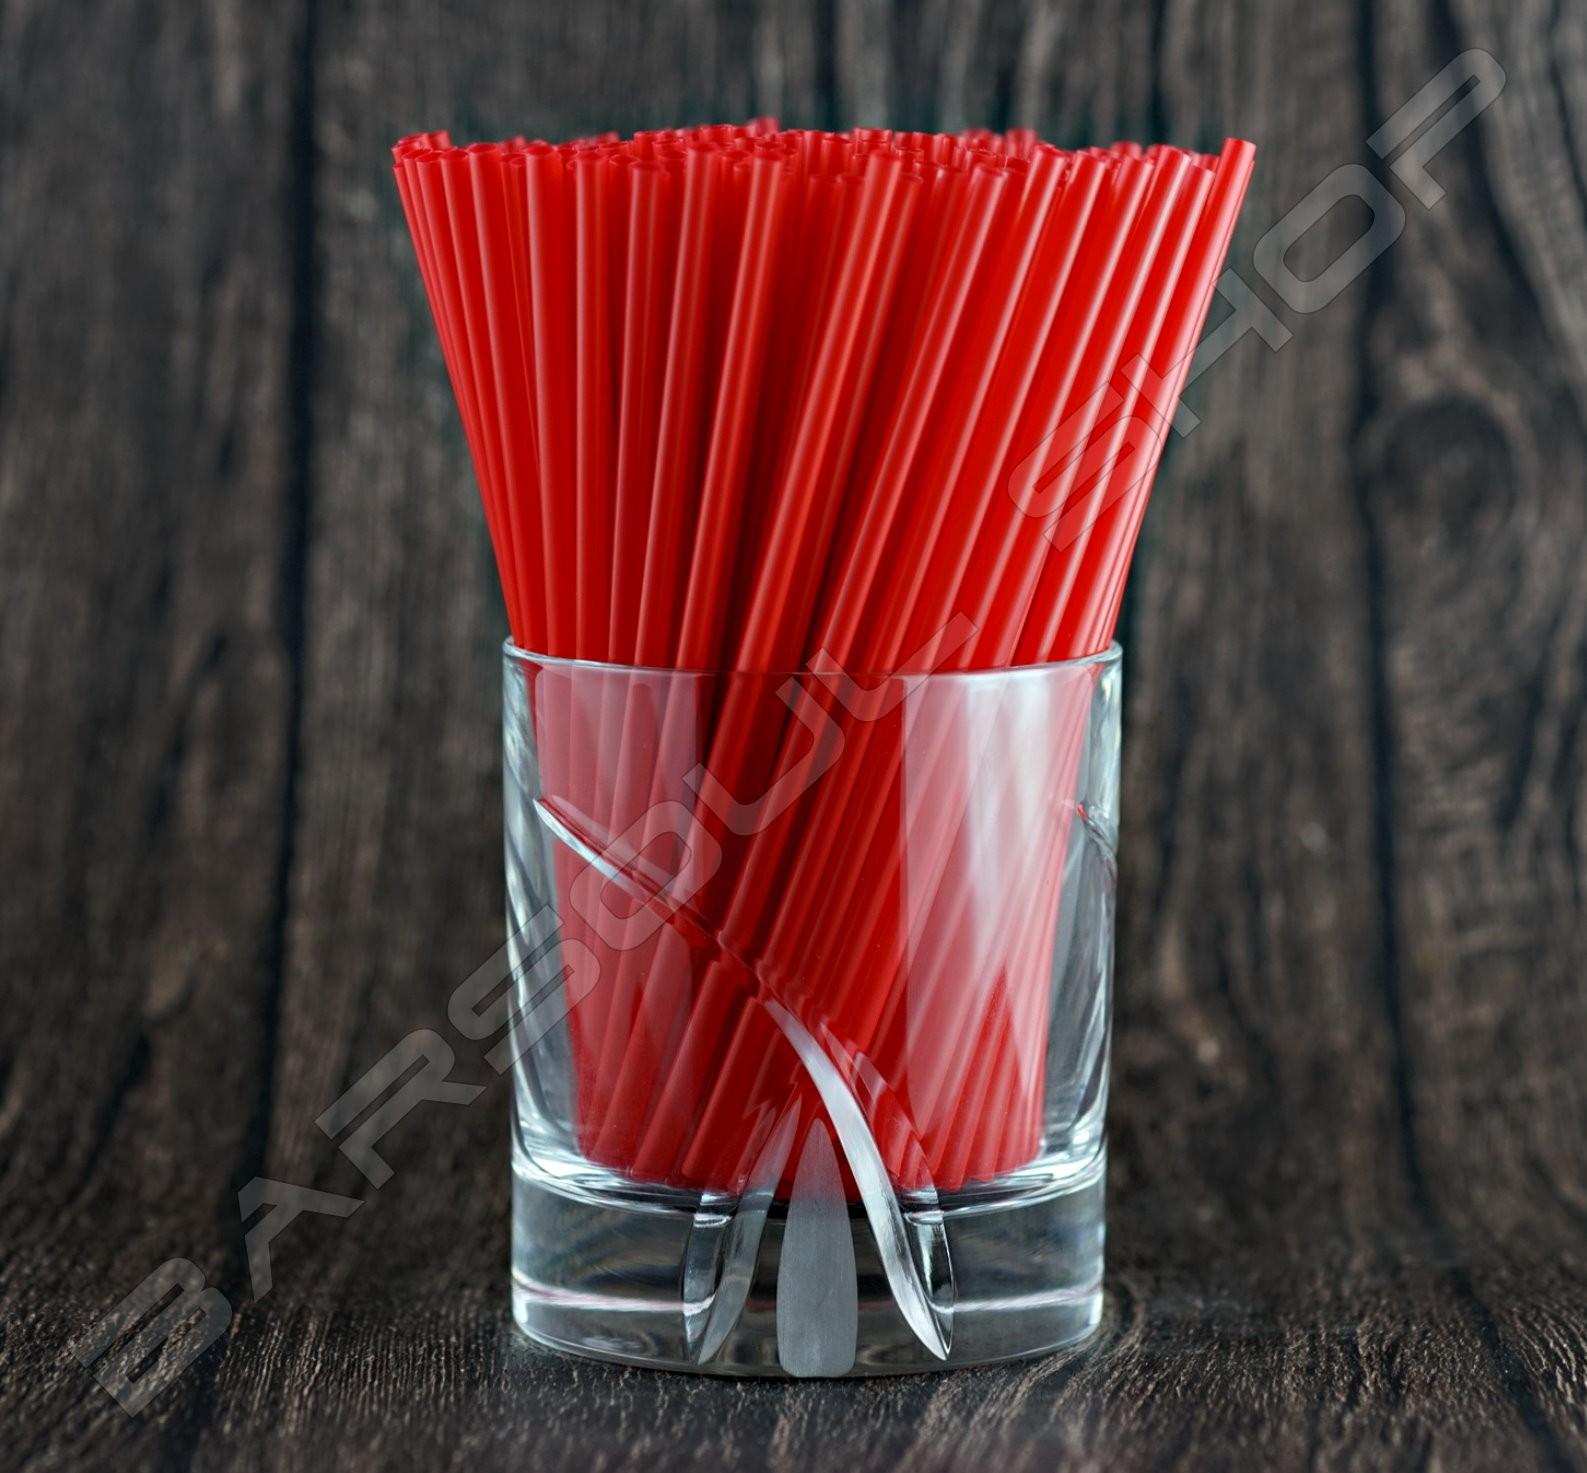 137mm紅色耐火細吸管 Red cocktail straws